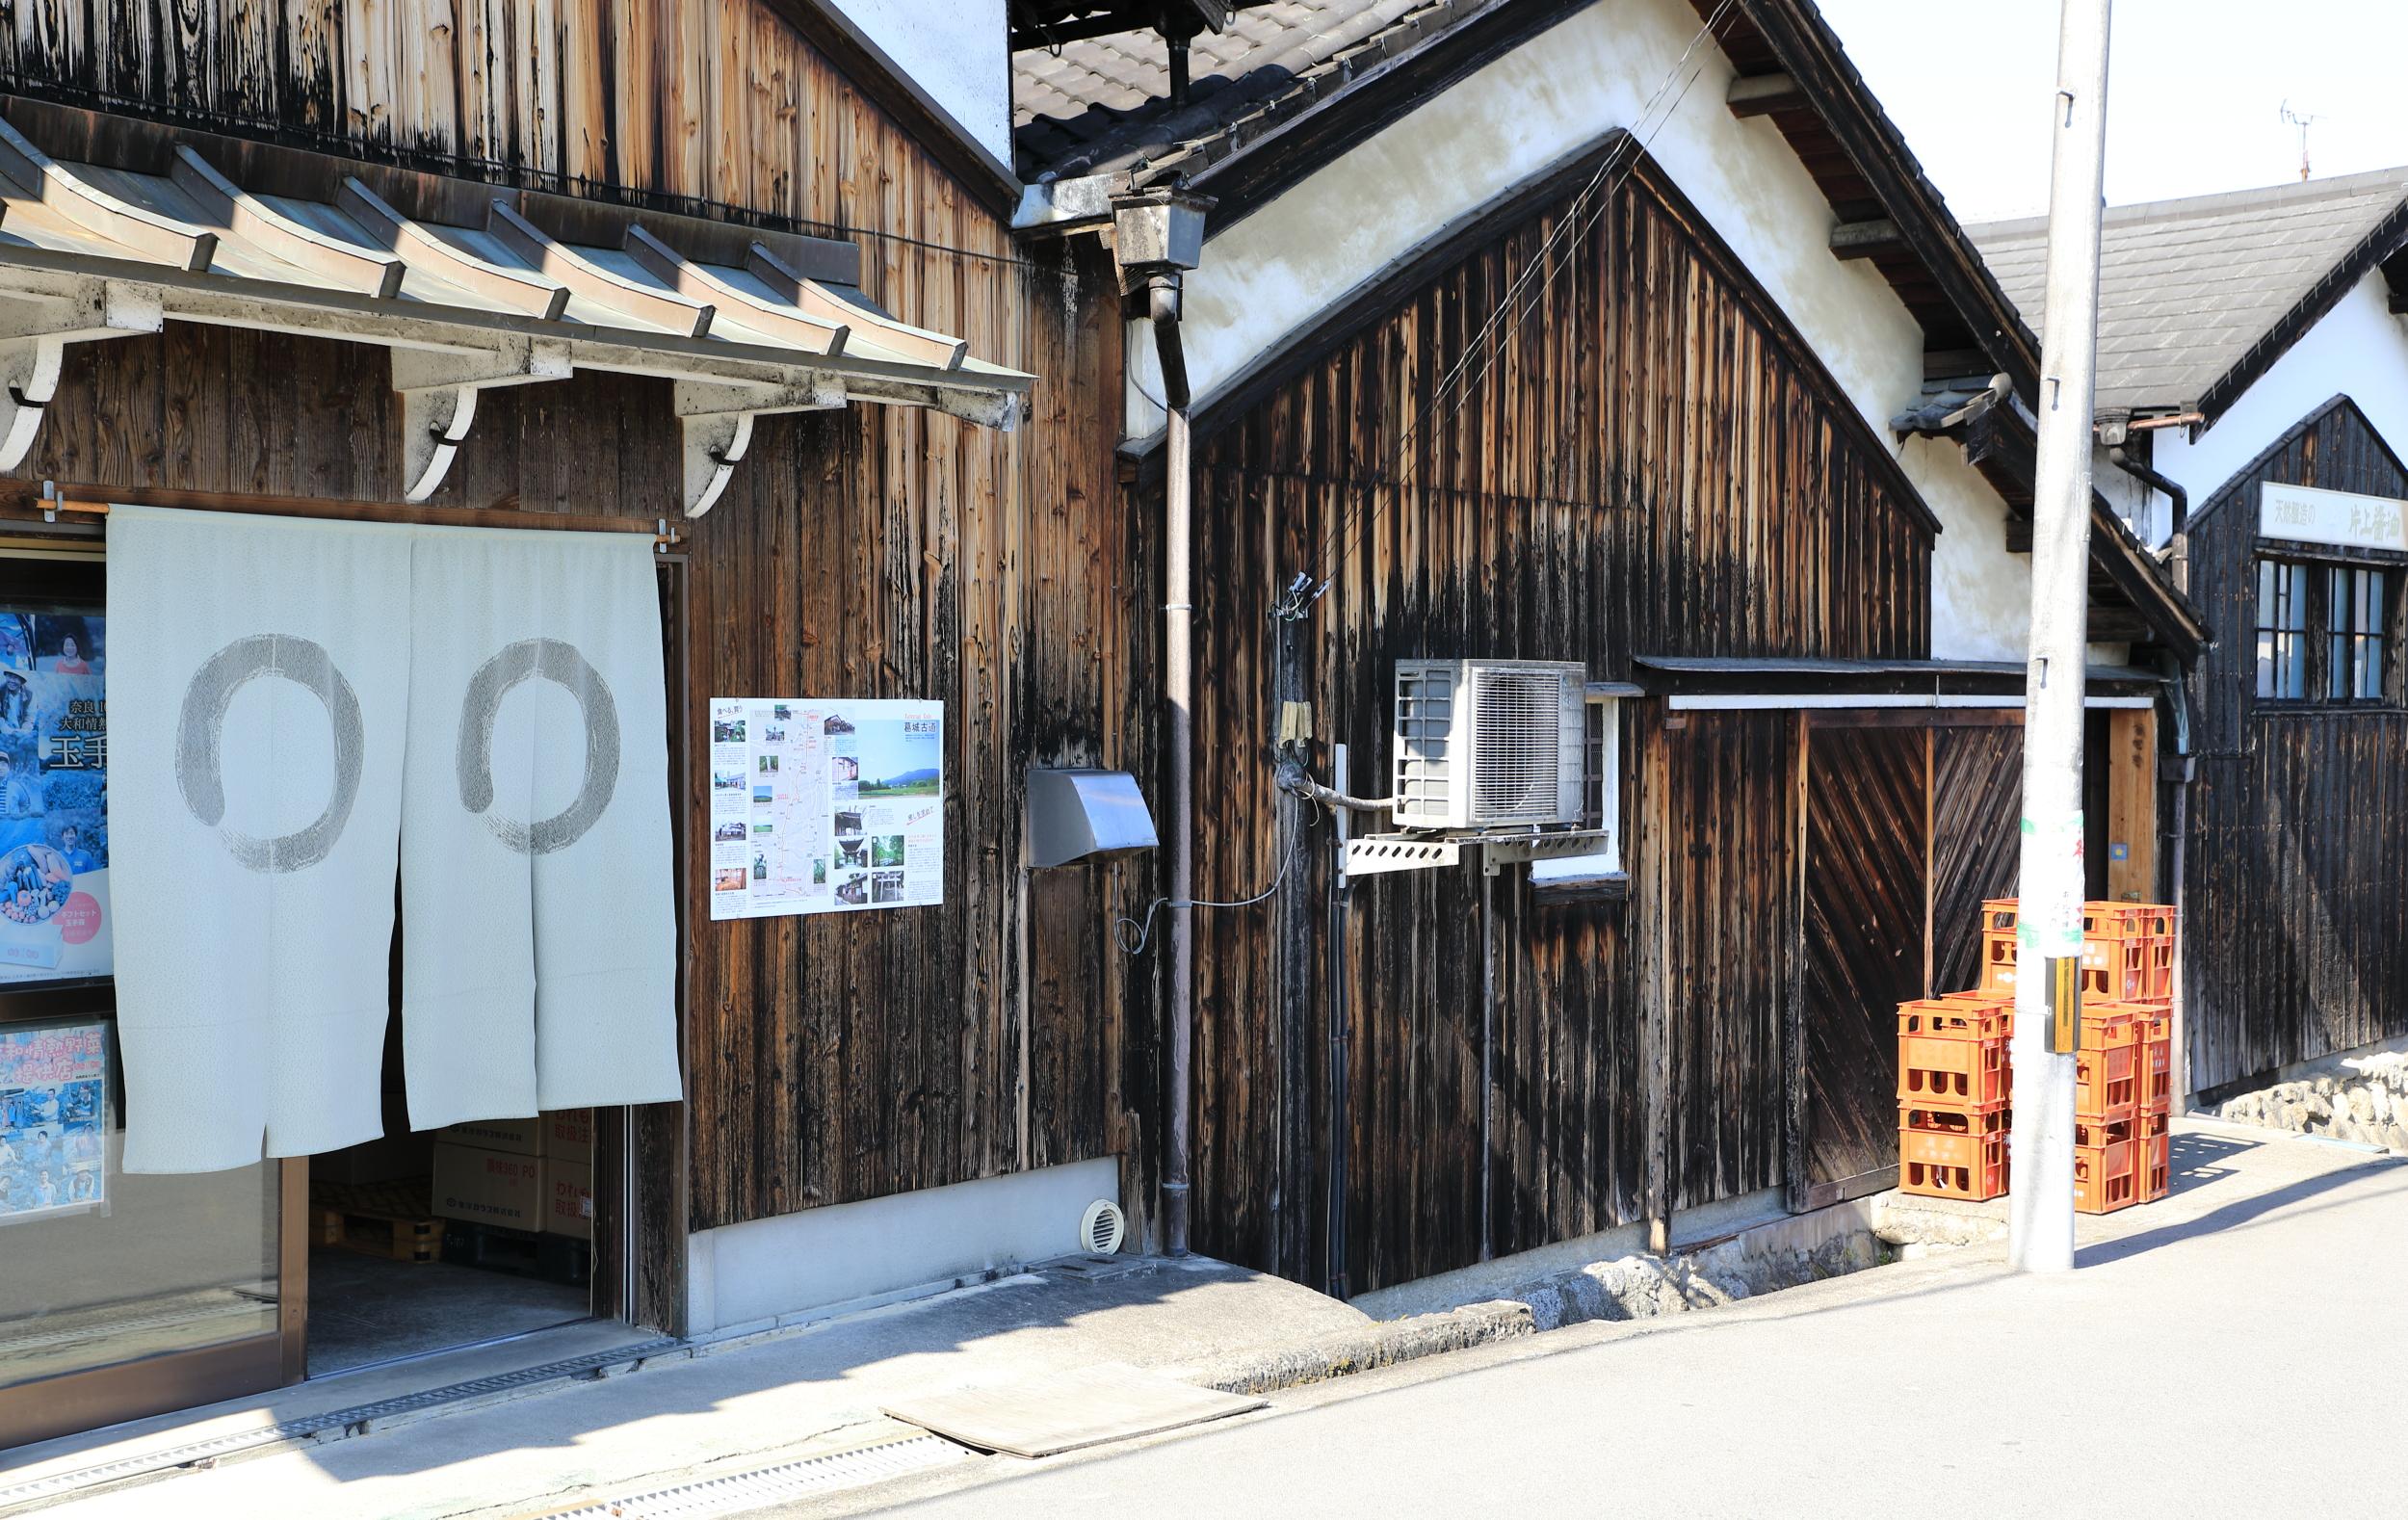 Katakami Soy Sauce shop and brewery.